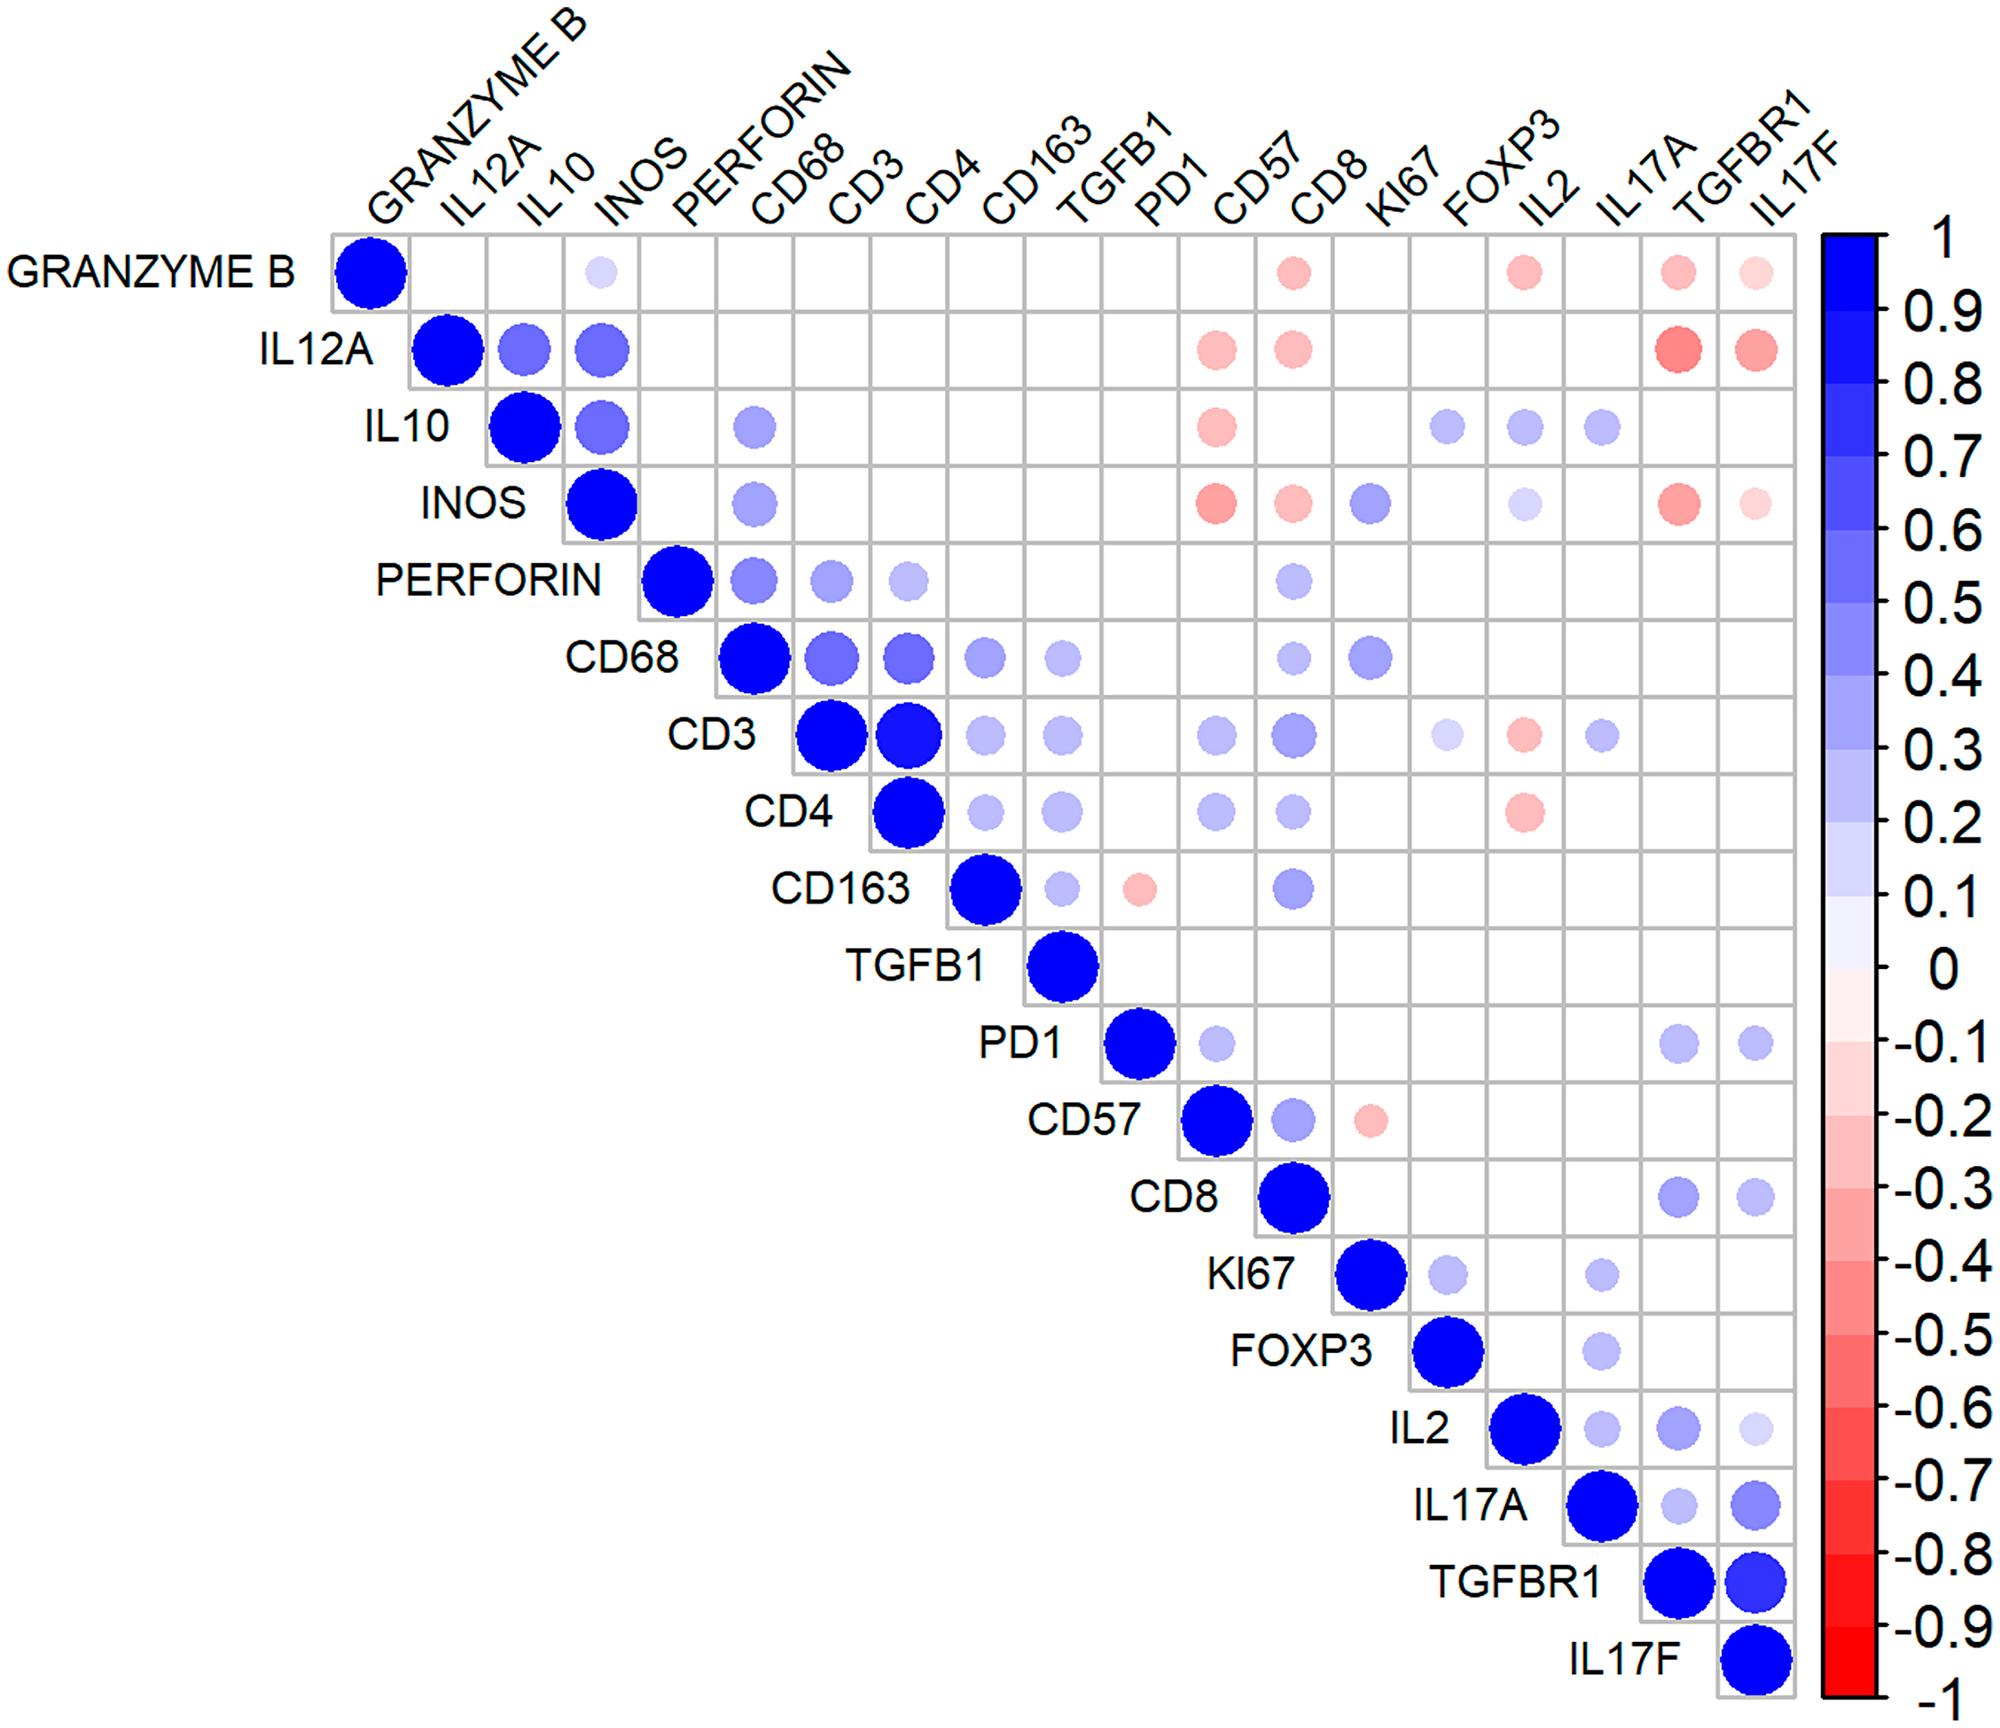 Correlation matrix for the immunohistochemical markers in follicular lymphoma.